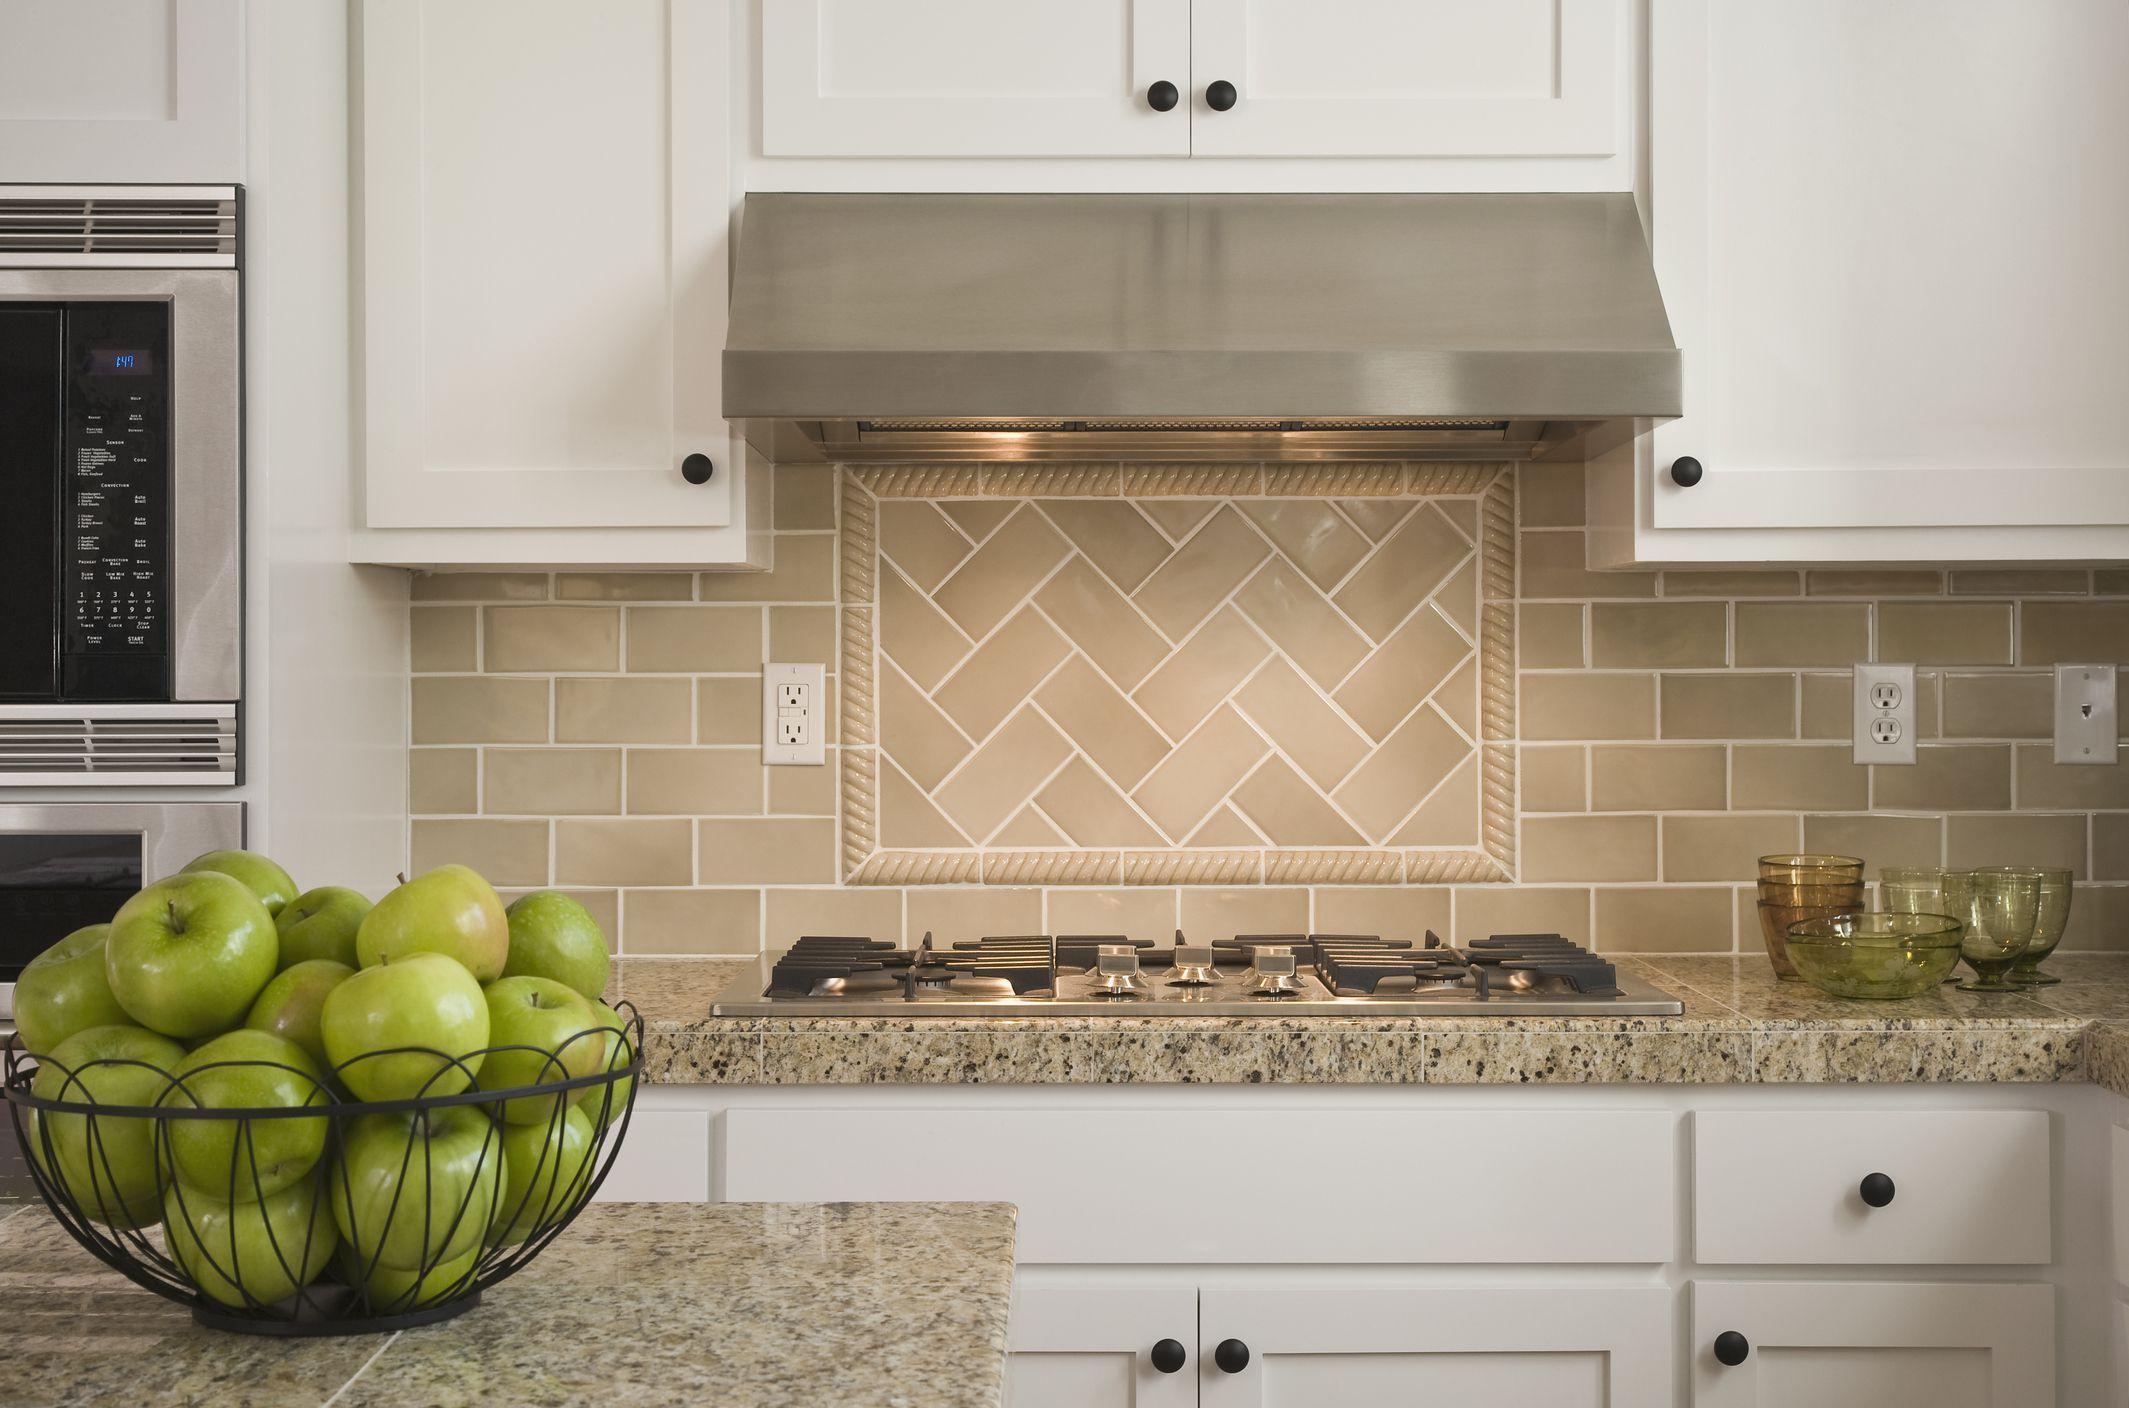 Discover And Compare The Best Kitchen Backsplash Materials Kitchen Design Diy Kitchen Remodel Small Kitchen Backsplash Images